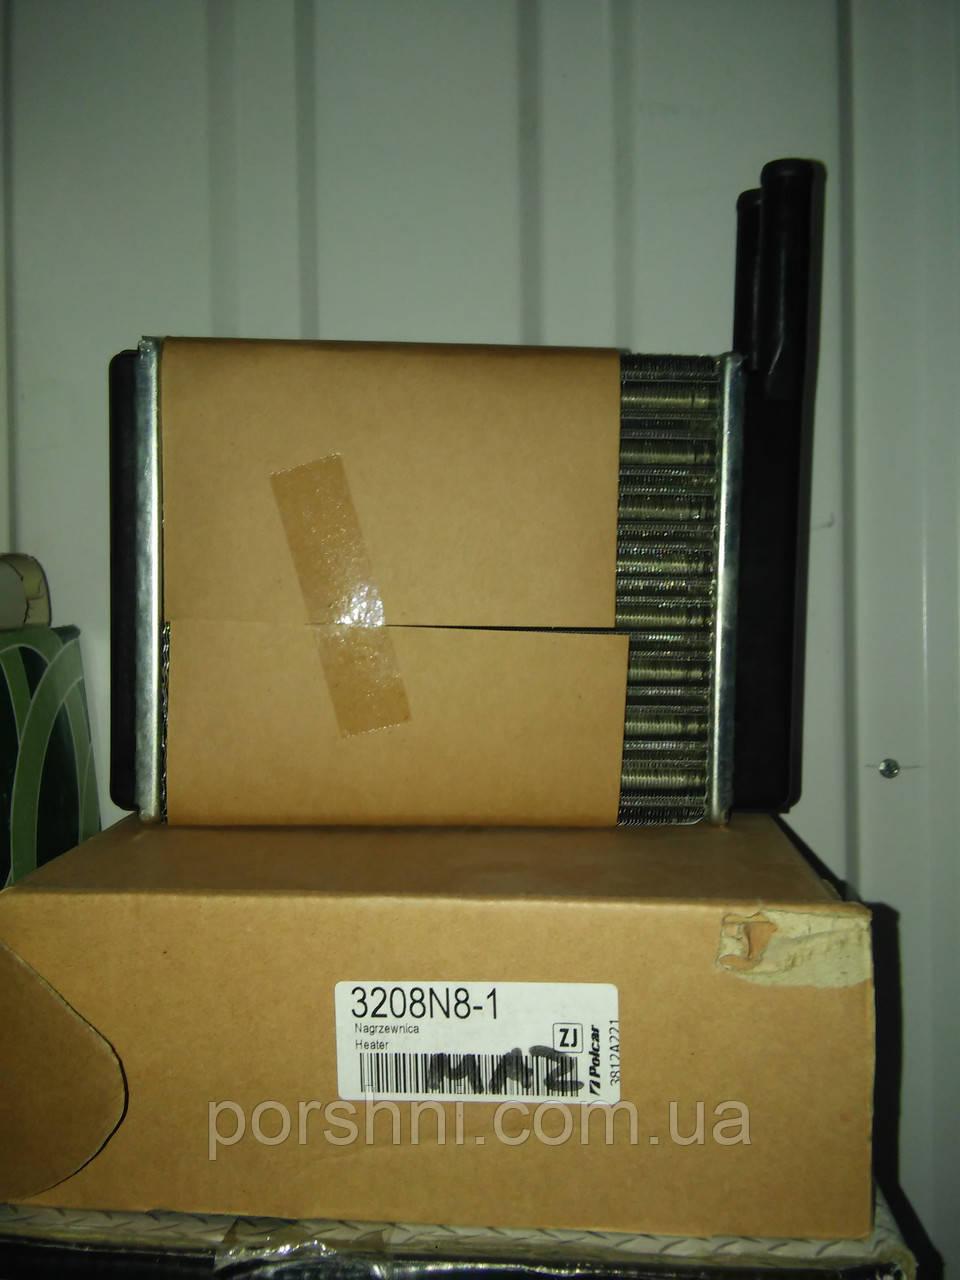 Радиатор  печки  Fiesta  83 -- 89 г.  3208N8-1